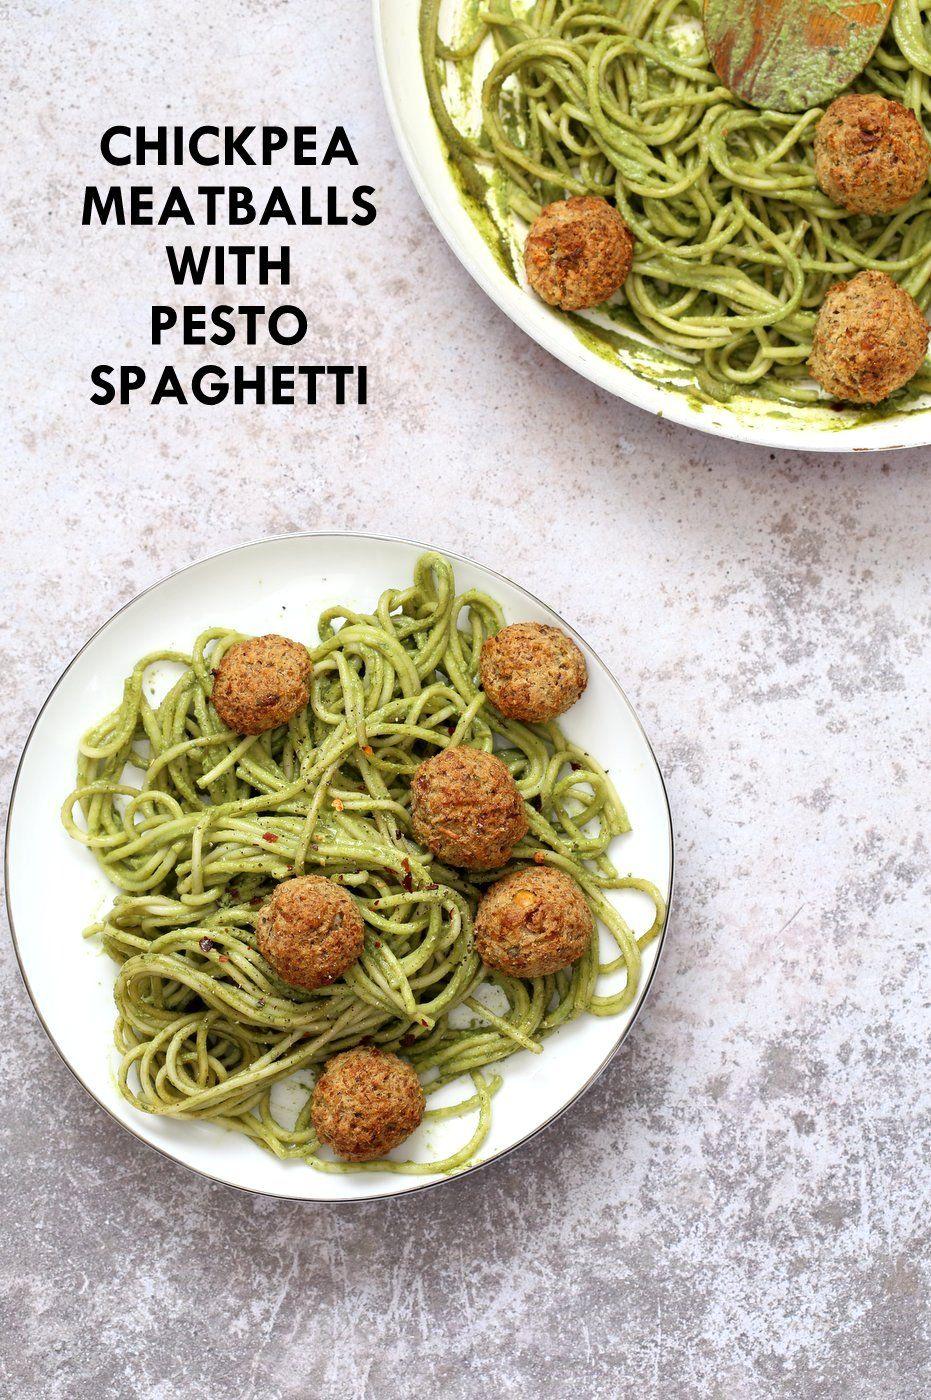 Pesto Spaghetti With Vegan Meatballs Chickpea Walnut Balls Vegan Richa Recipe Chickpea Recipes Easy Vegan Italian Recipes Vegan Meatballs